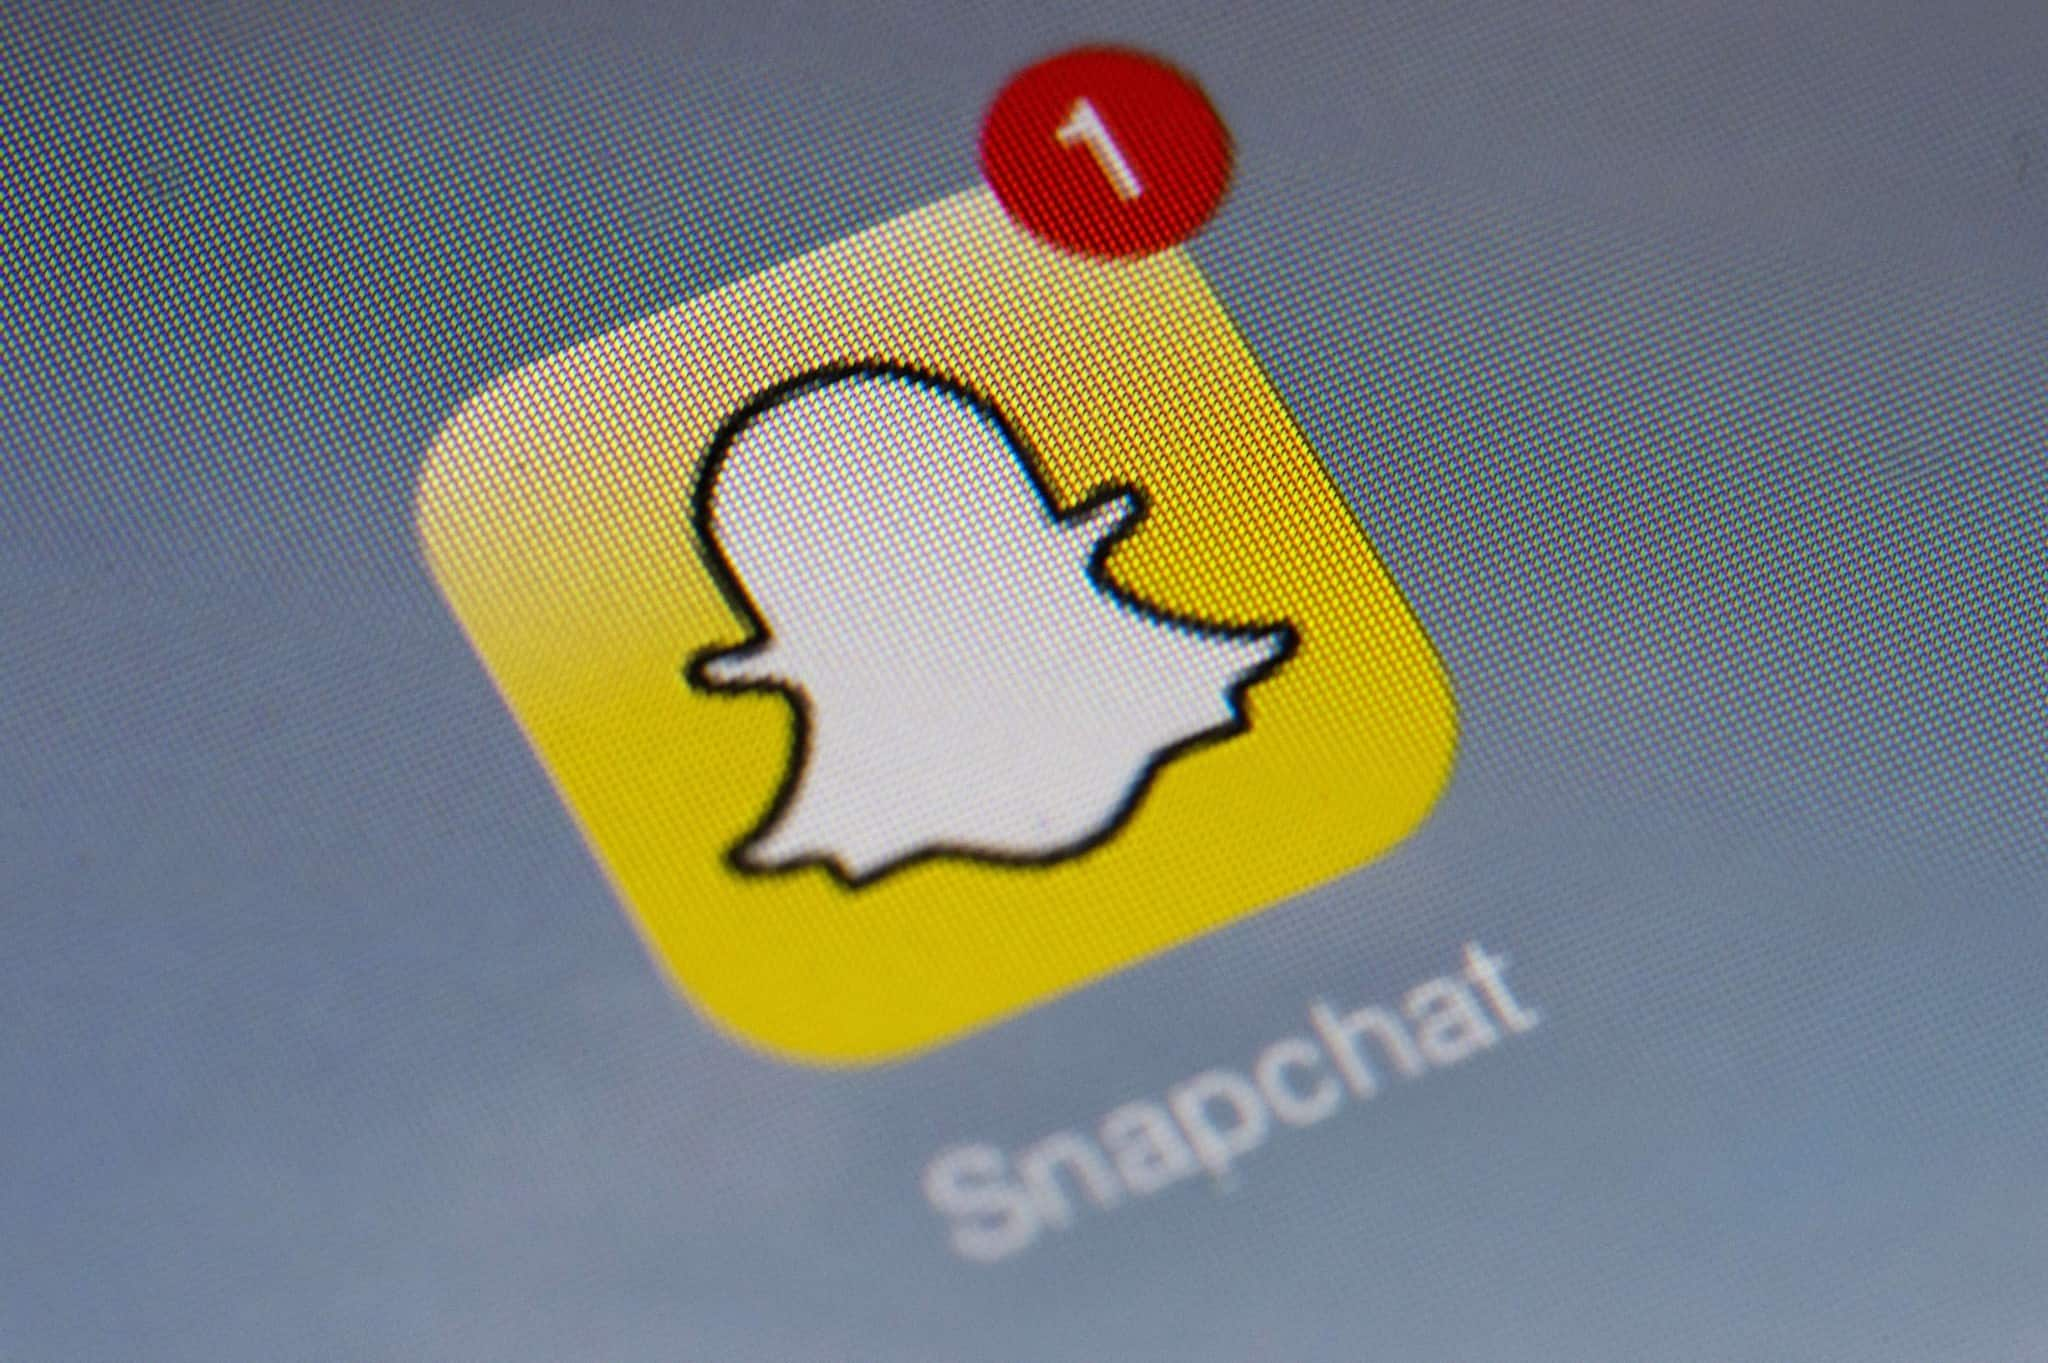 Snapchat comprou empresa israelense de realidade aumentada